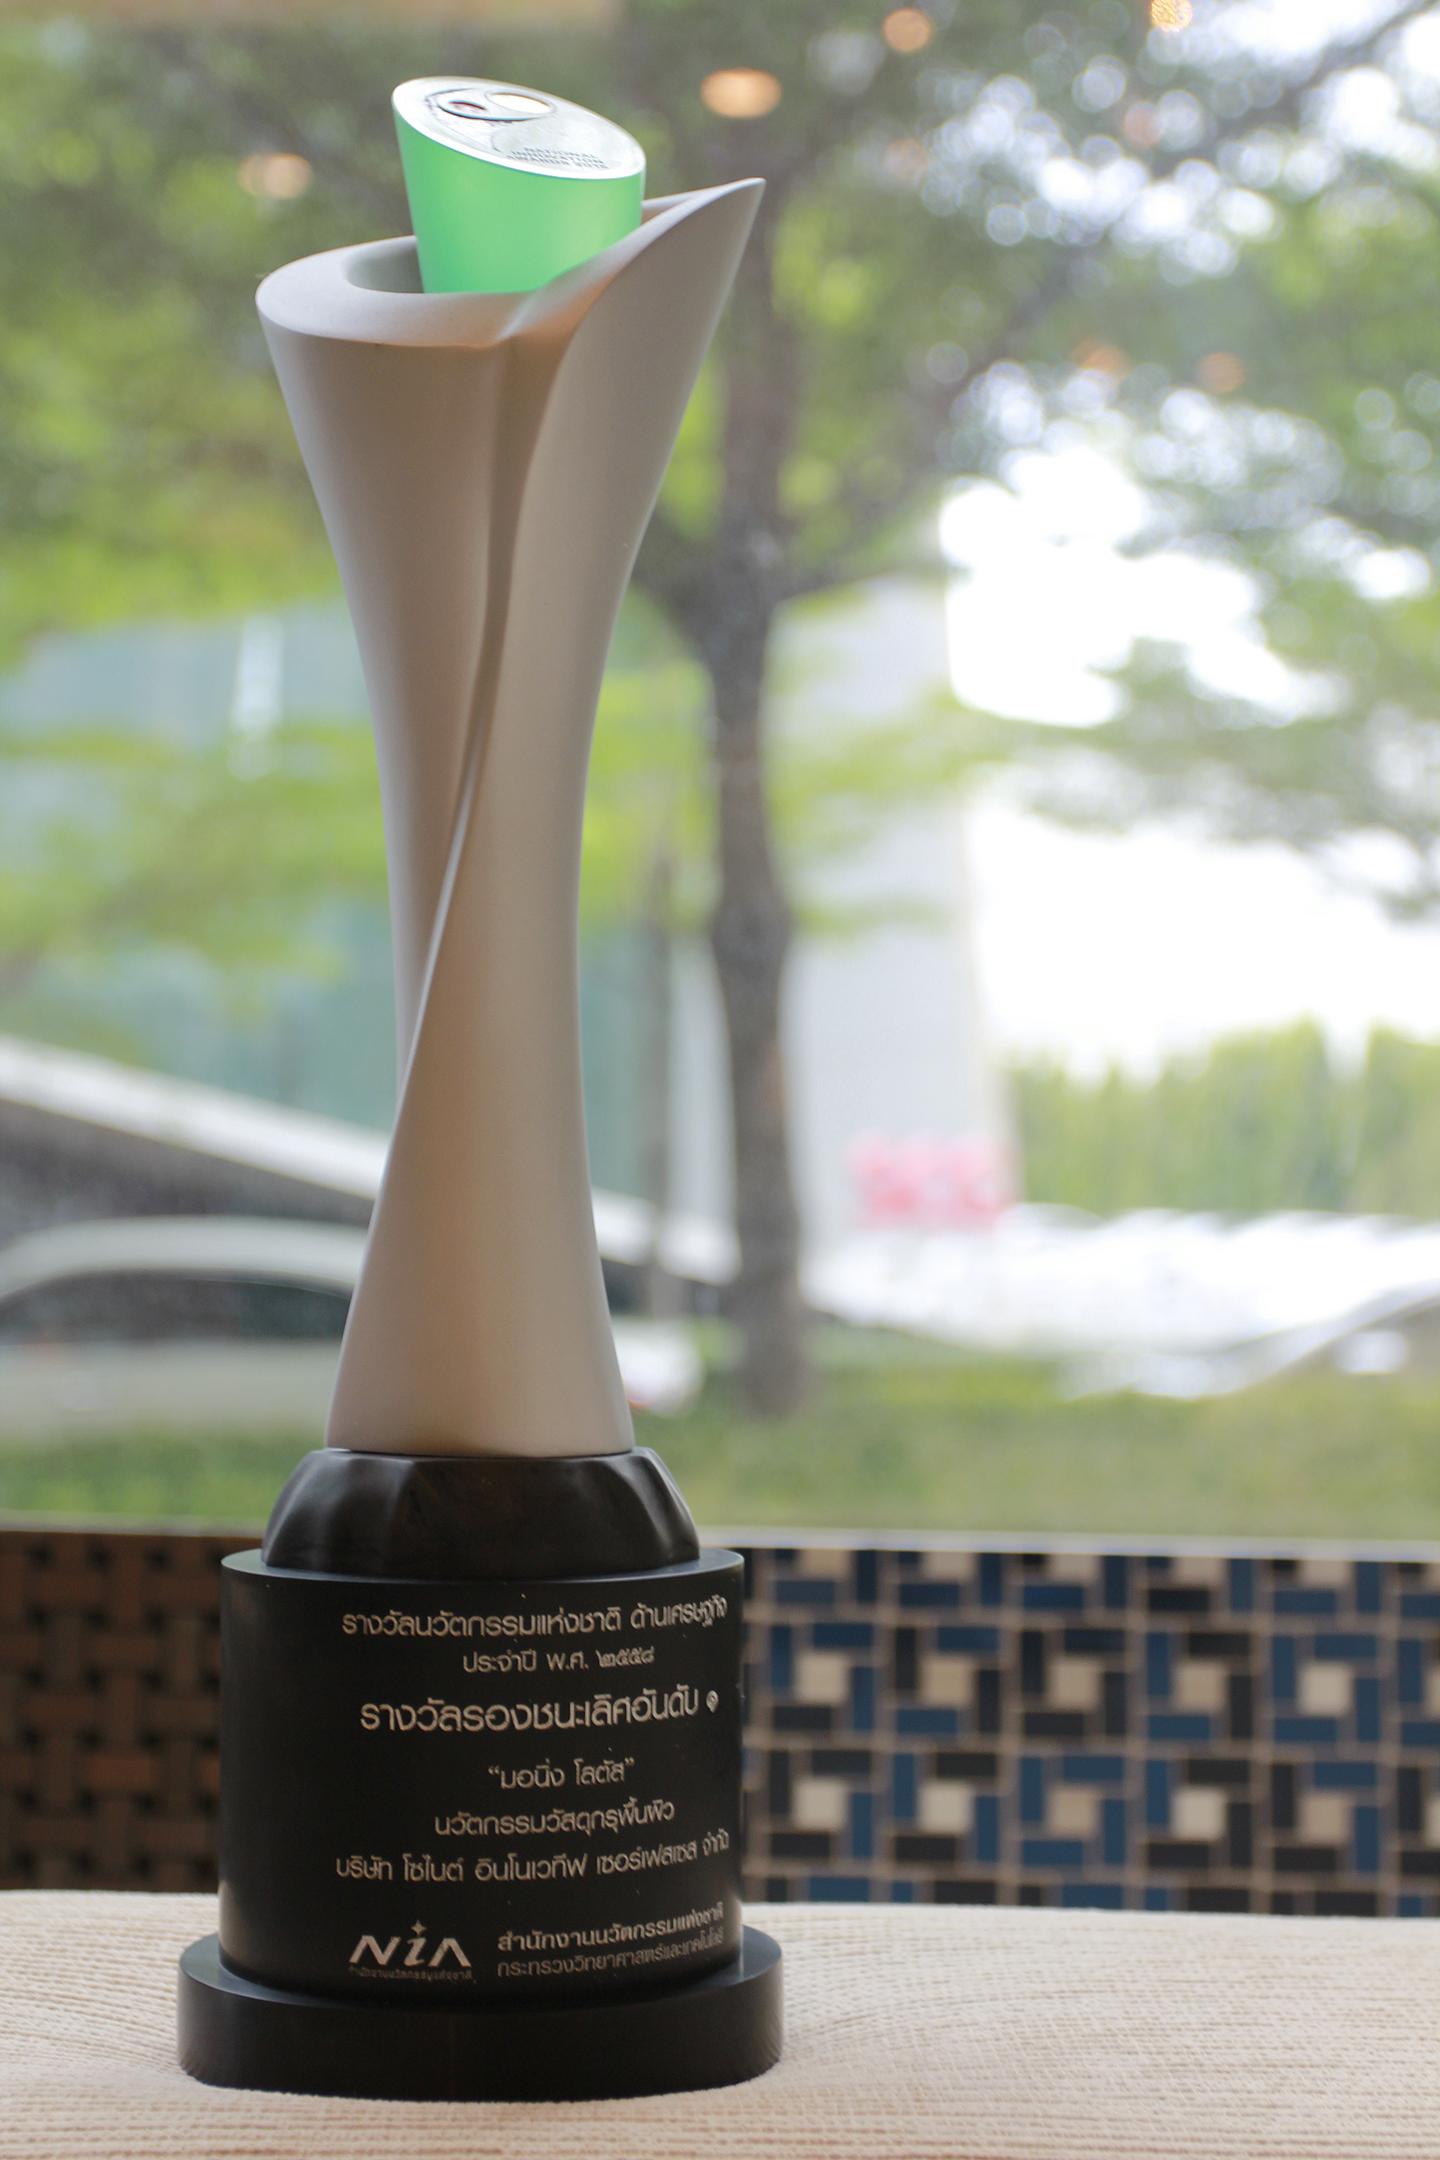 National Innovation Awards 2015